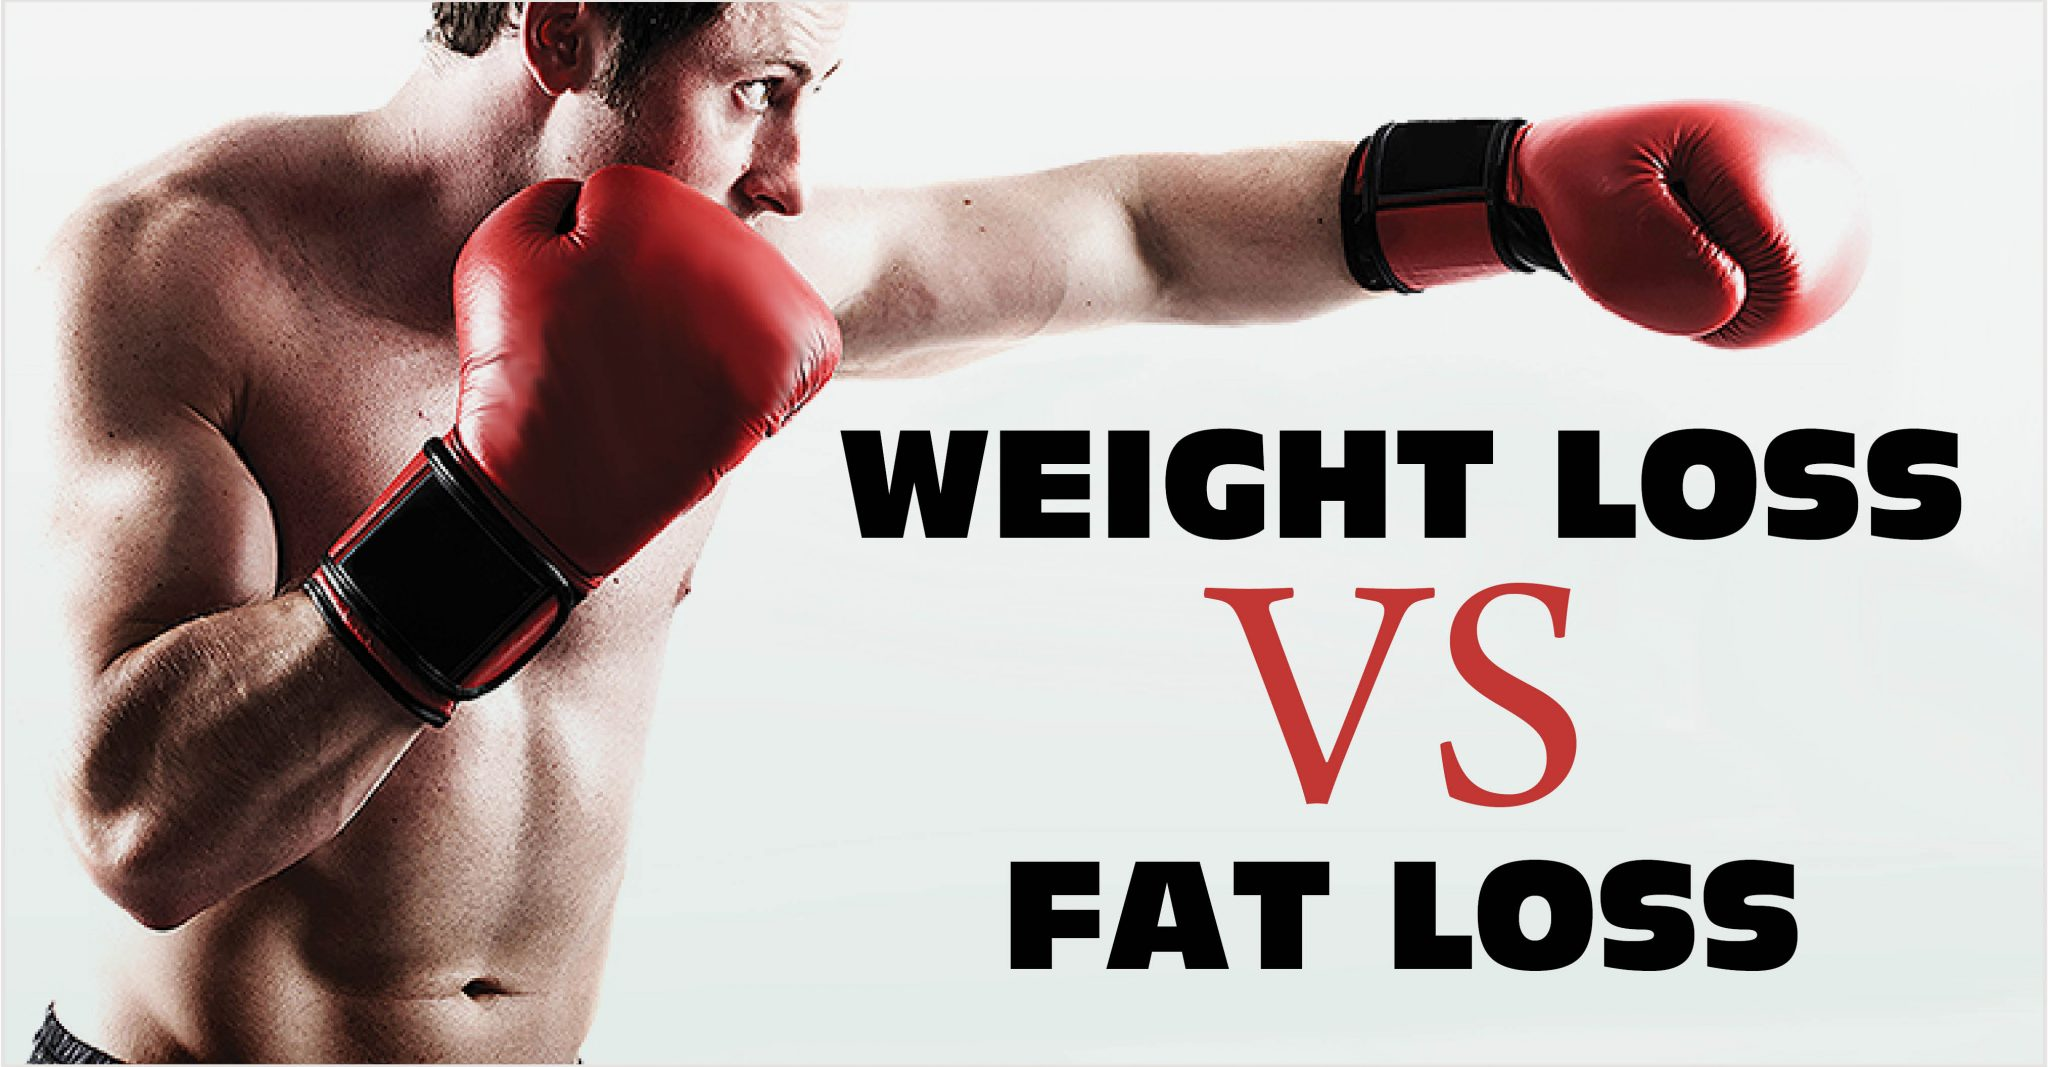 pierdere în greutate irvine ayrshire slimming lipo 3d